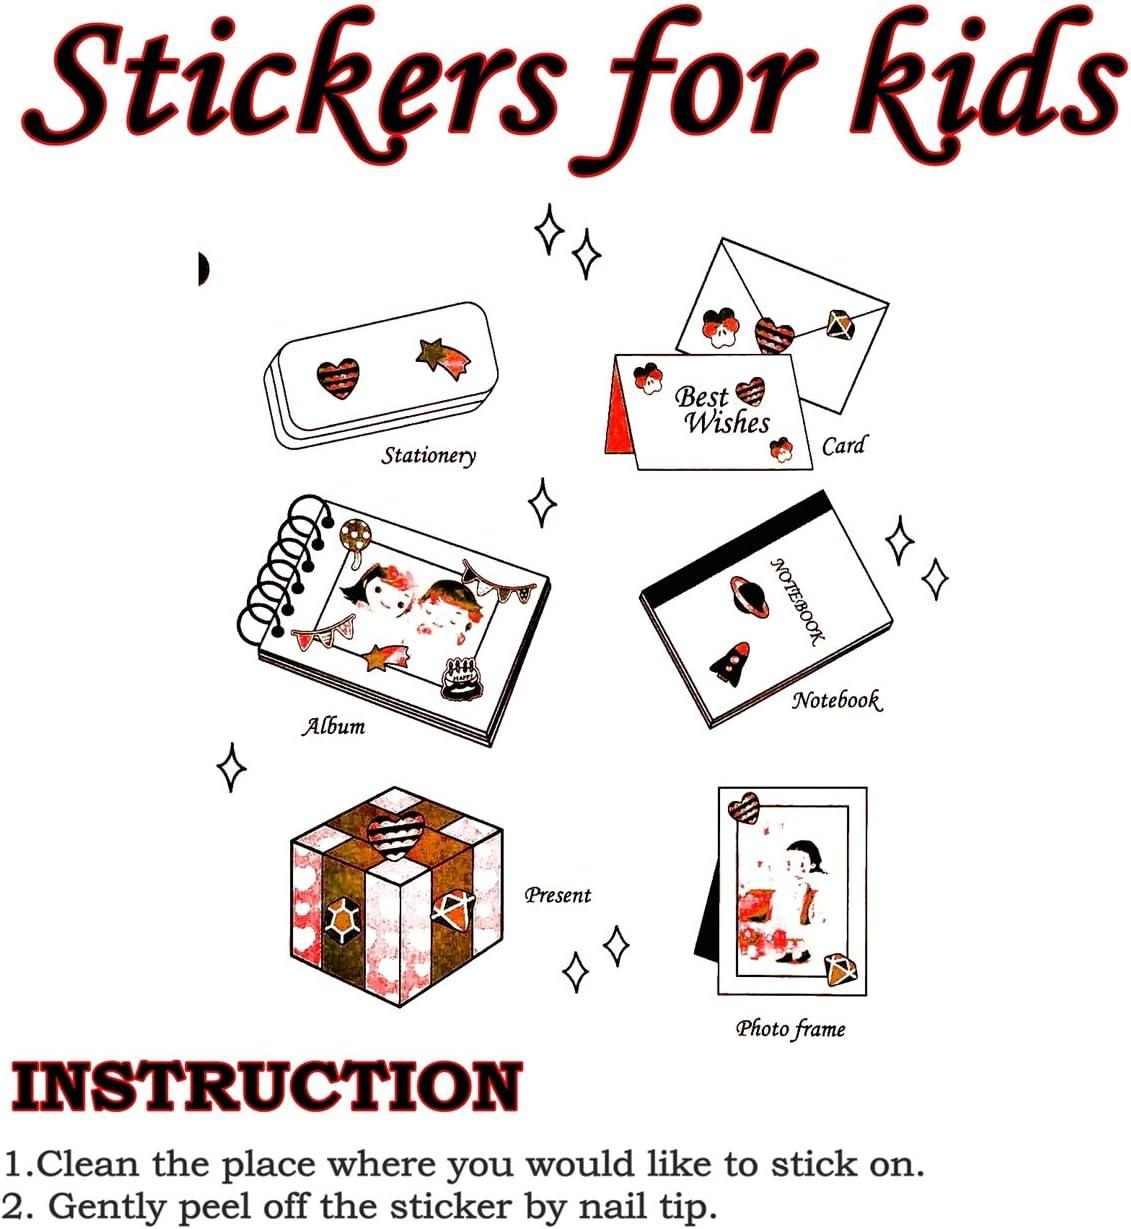 03 Pack 6 Sheets. PARITA Stickers Cute Colorful Vehicle Traffic Bus Van Cars Cartoon Stickers Decal Art Label Glue Crafts Design Scrapbooking Calendar Diary Photo Book for Teacher Children Kids